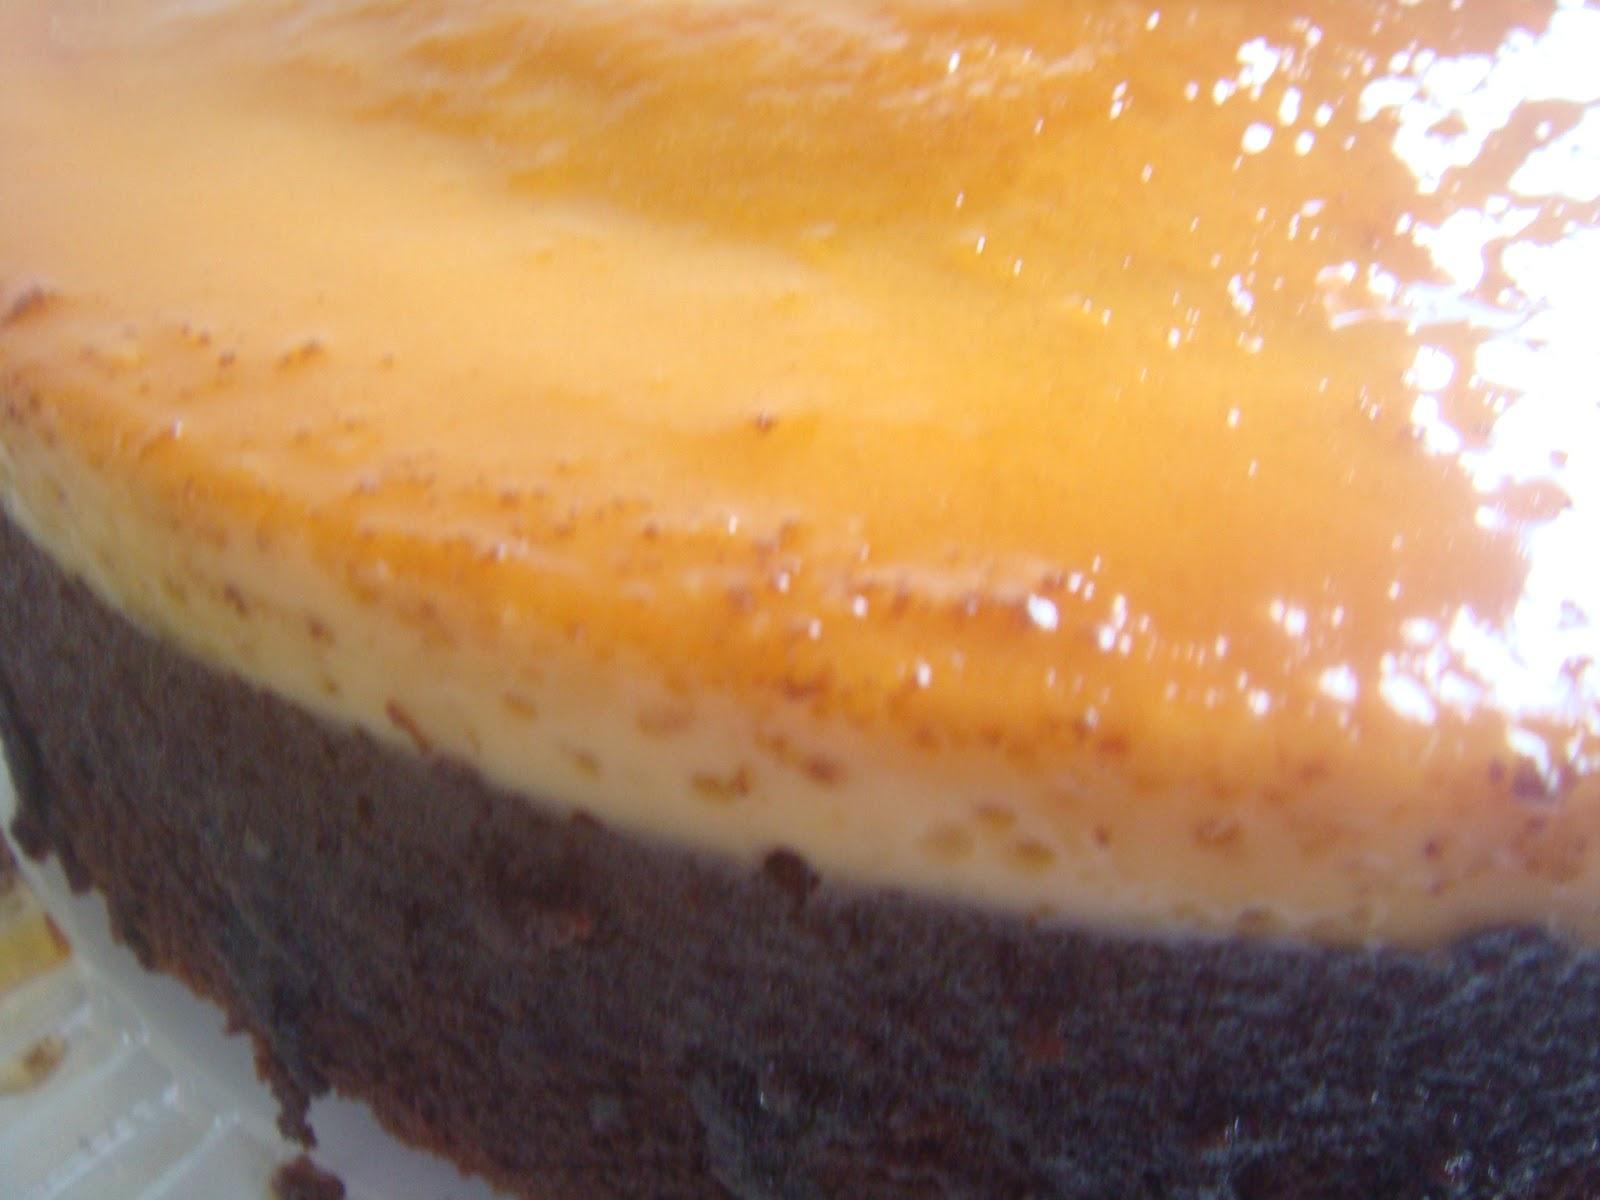 resepi kek coklat moist  ganache soalan Resepi Kek Pelangi Lembab Enak dan Mudah